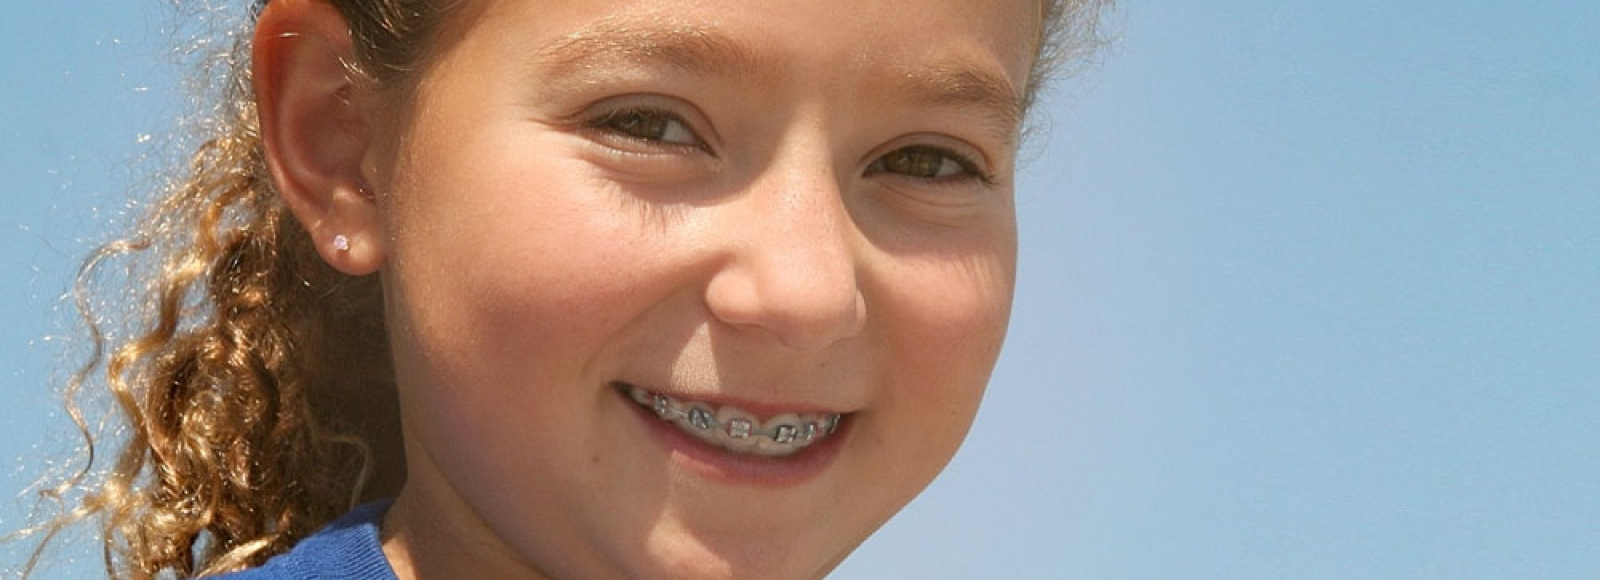 Warsaw Orthodontics